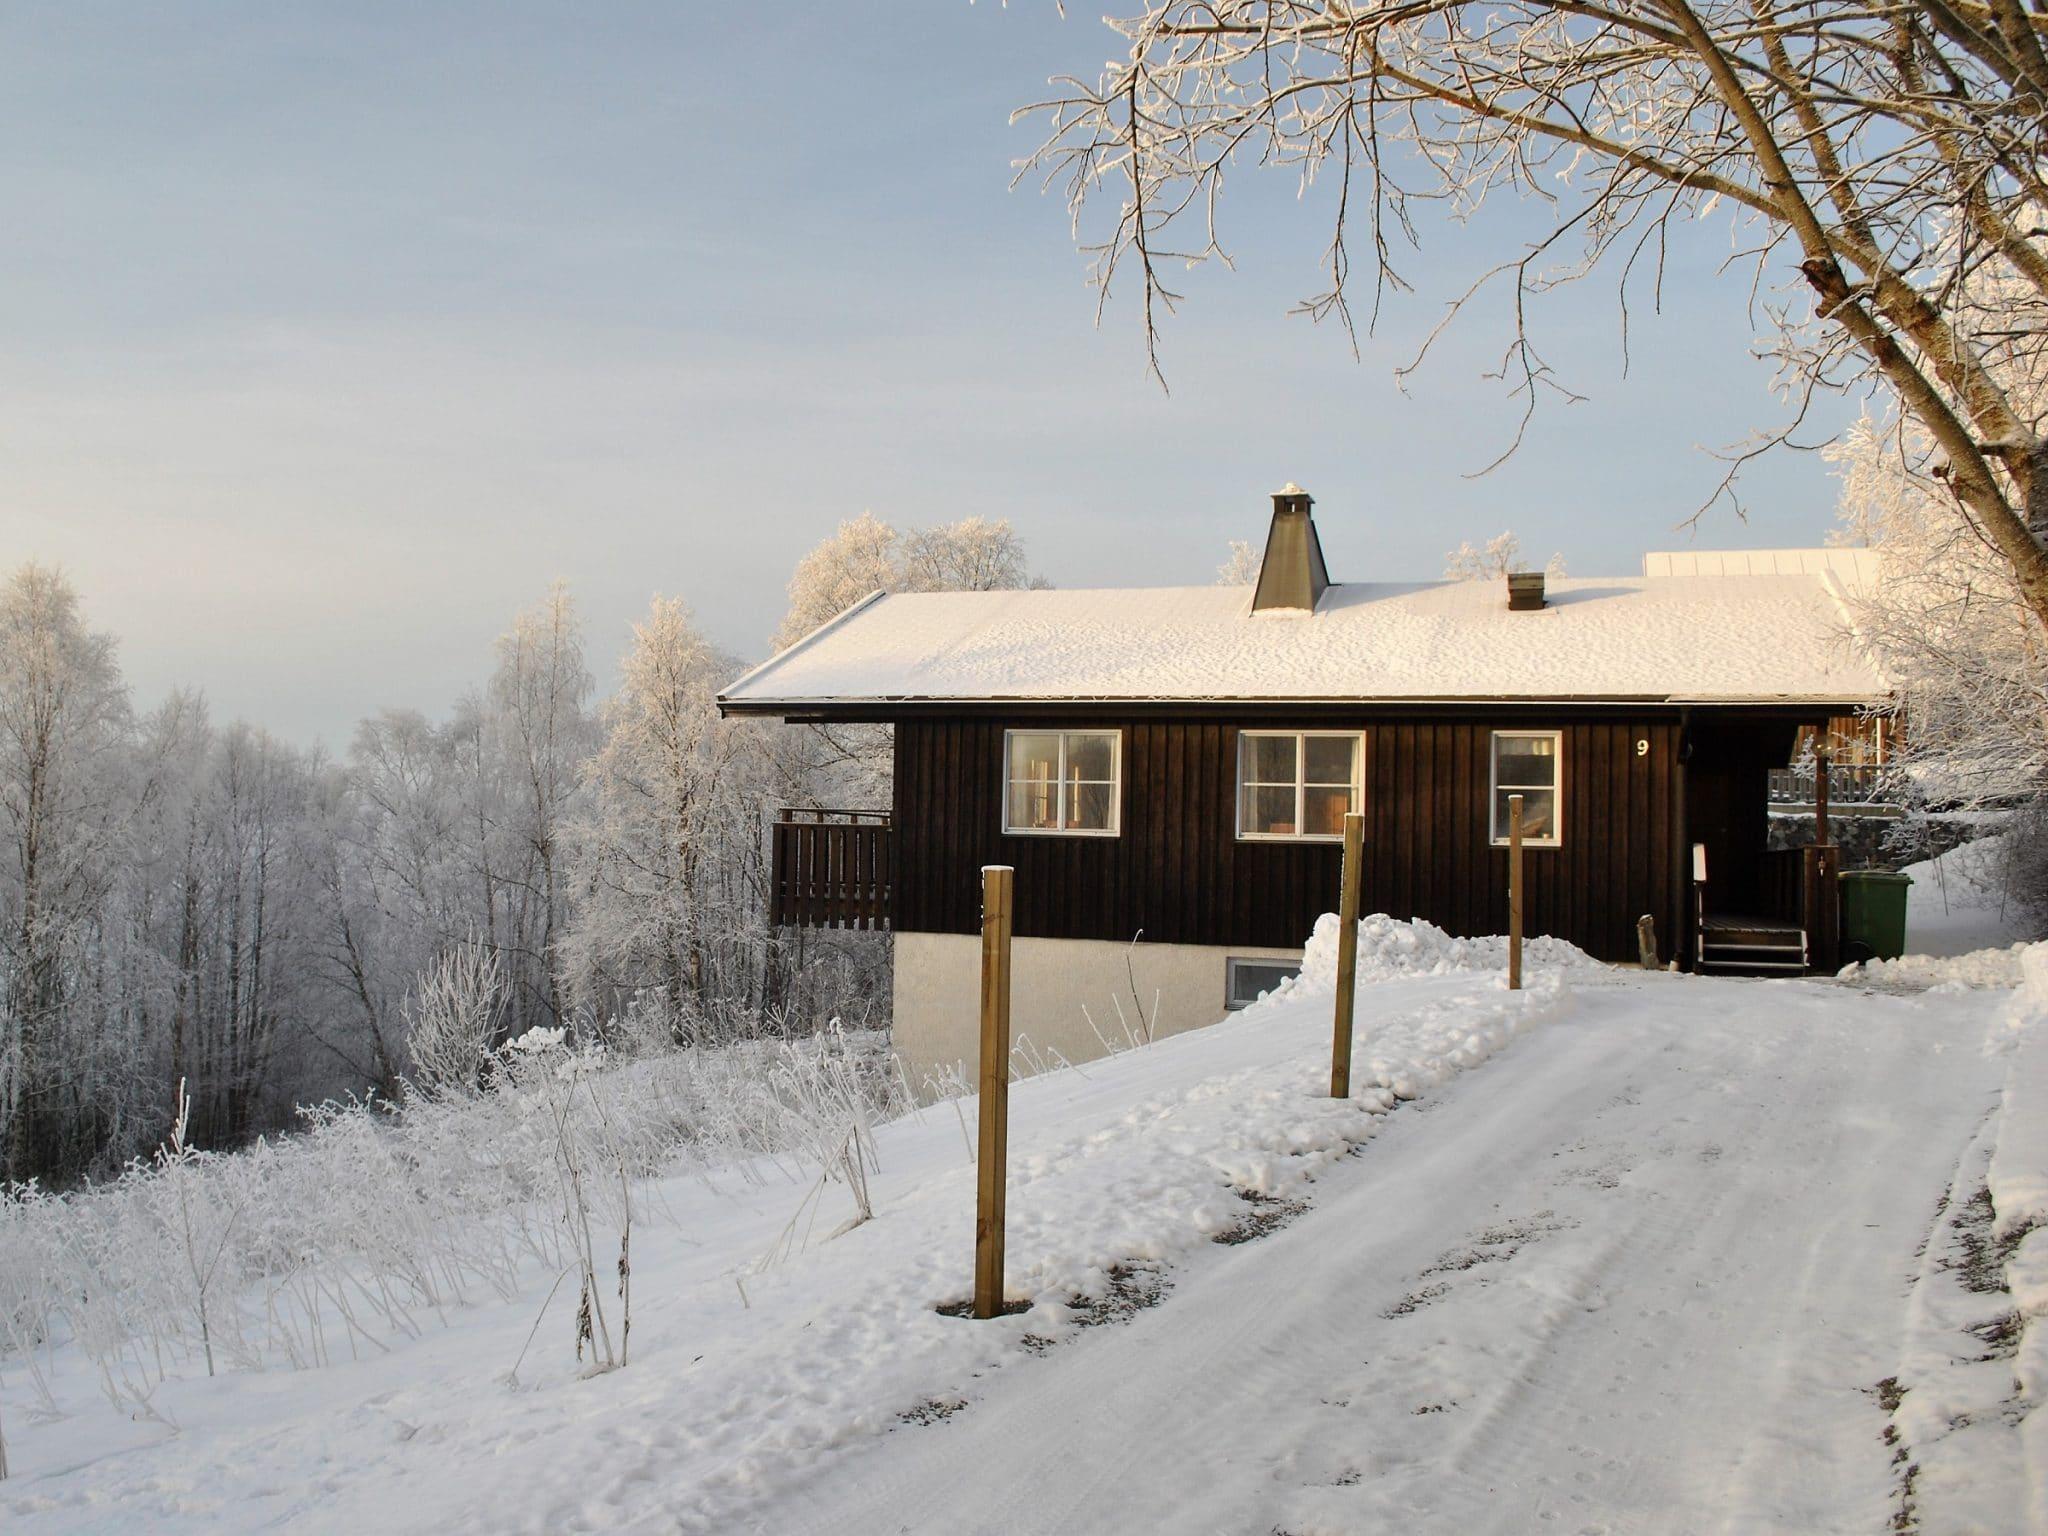 Slalomsvängen 9, cottage in Åre